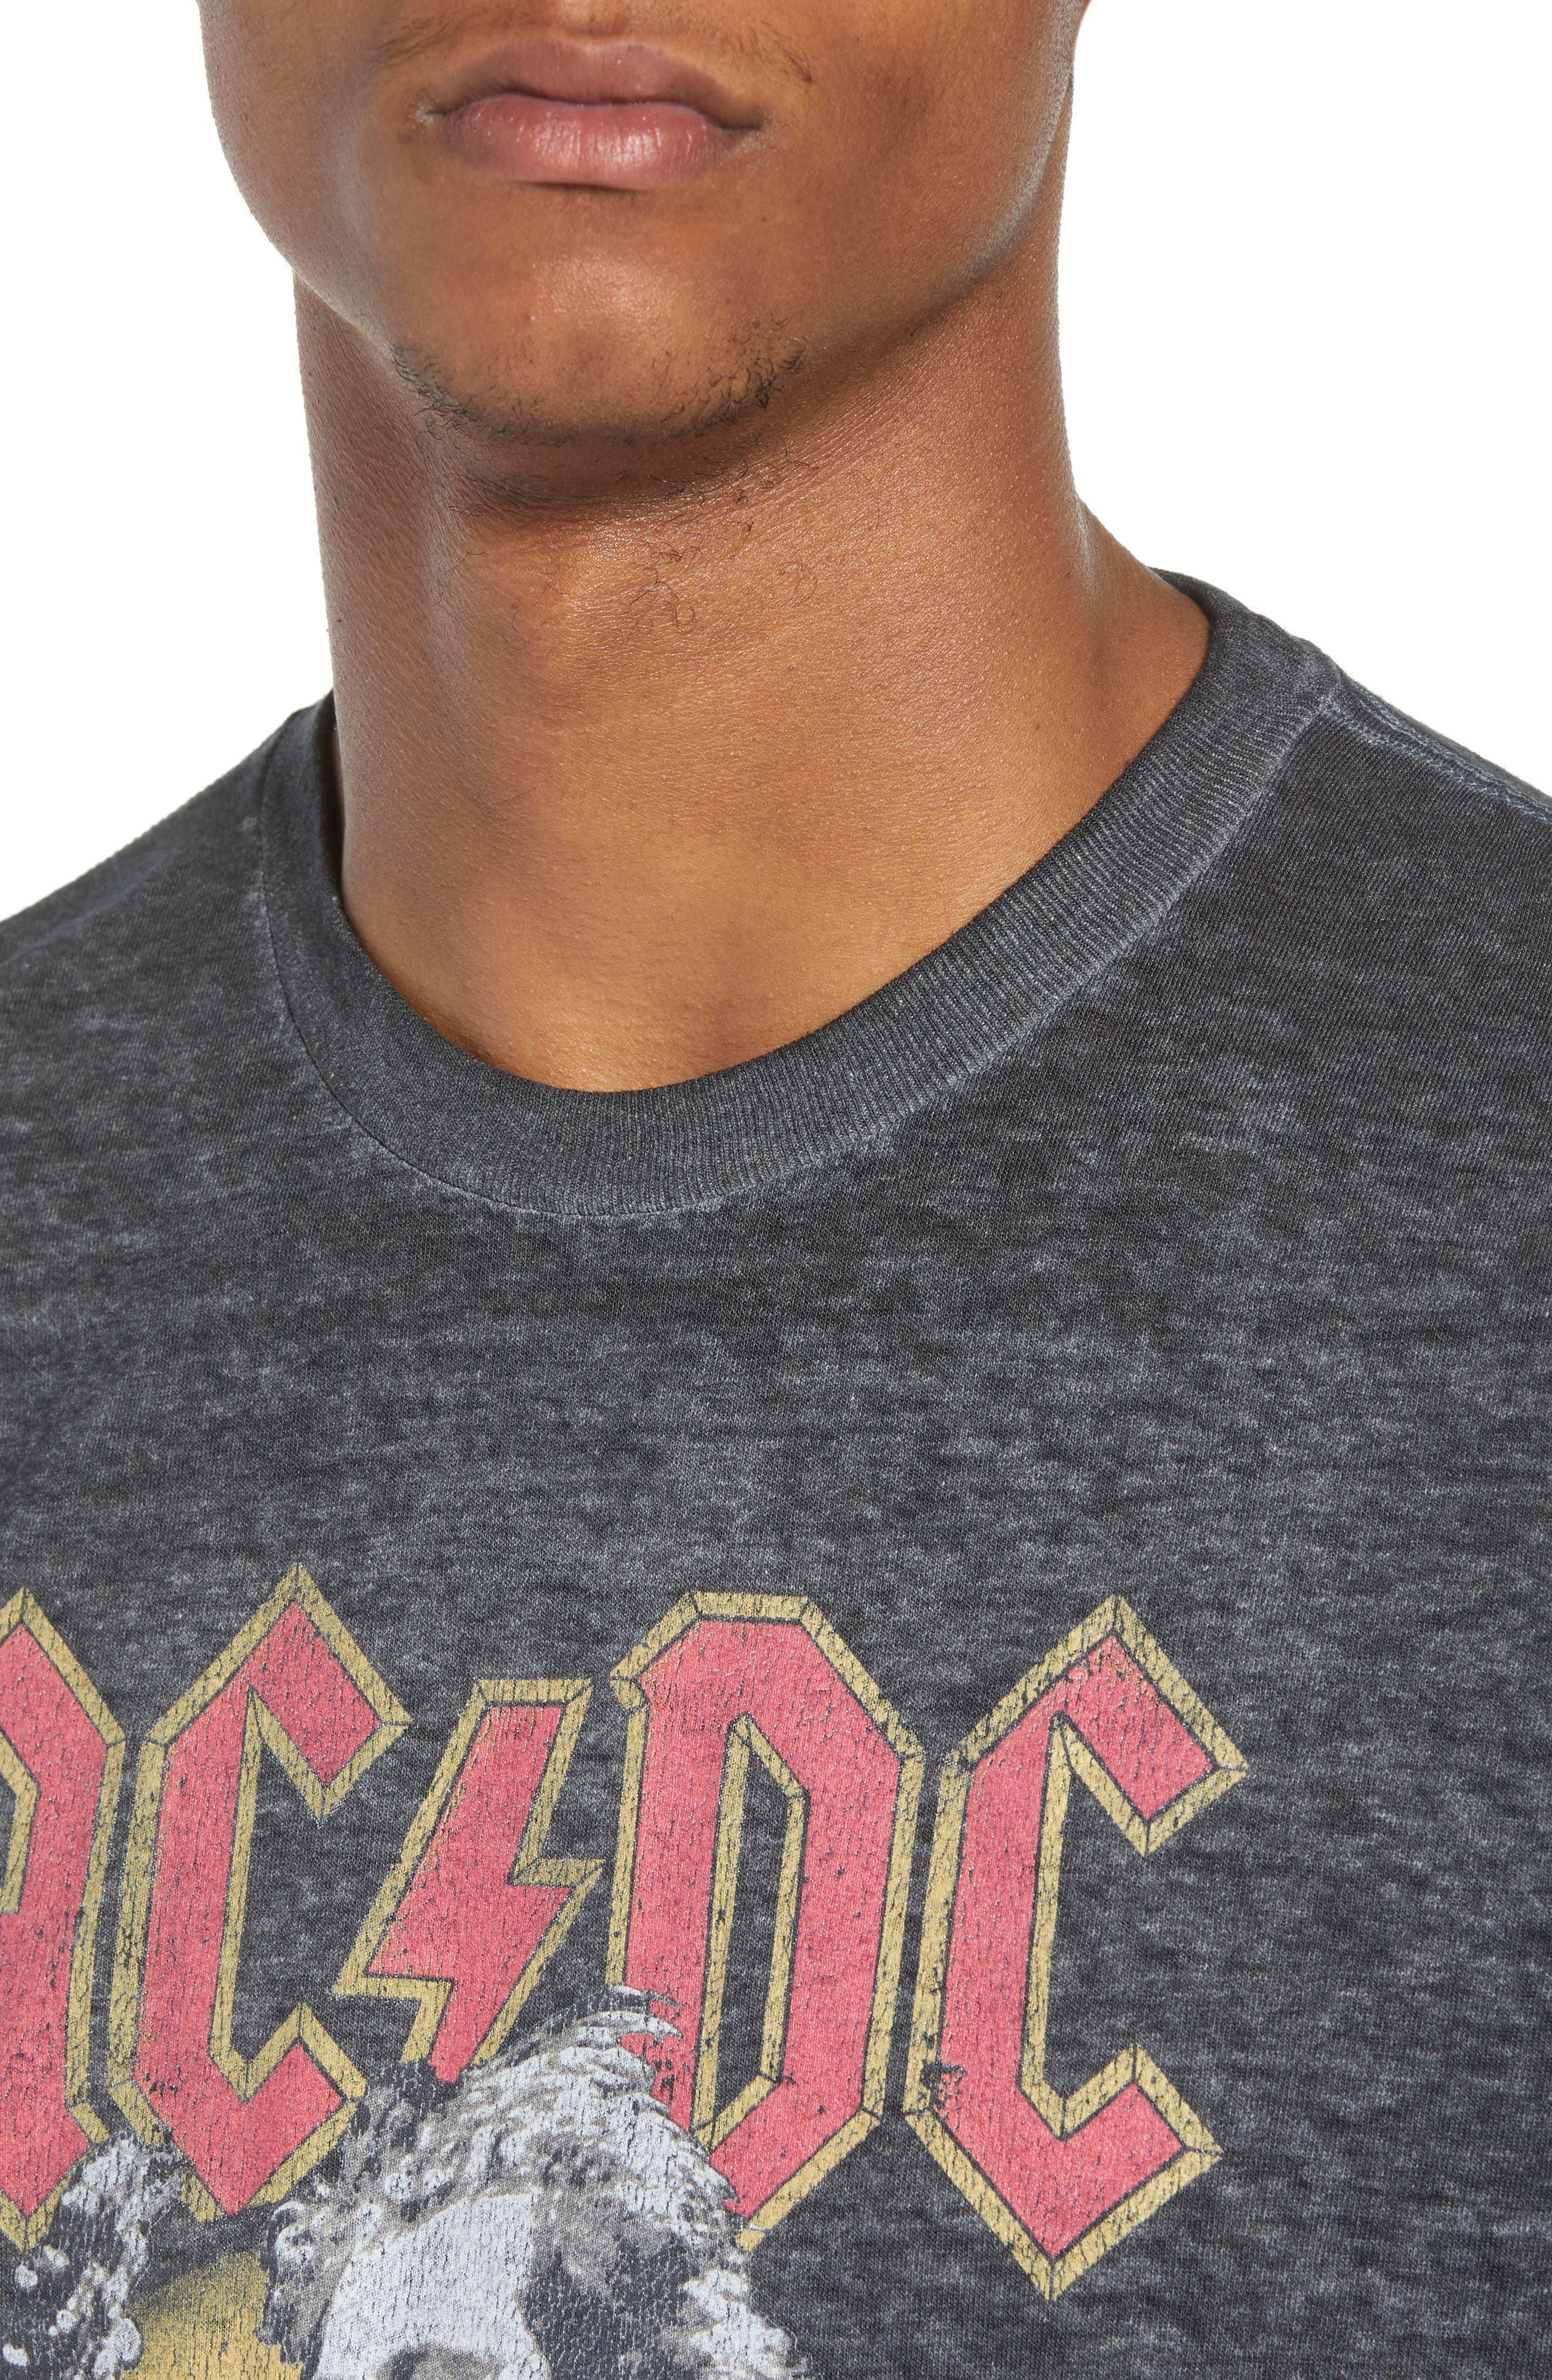 AC/DC Live at The Donington T-Shirt,                             Alternate thumbnail 4, color,                             Grey Acdc Burnout